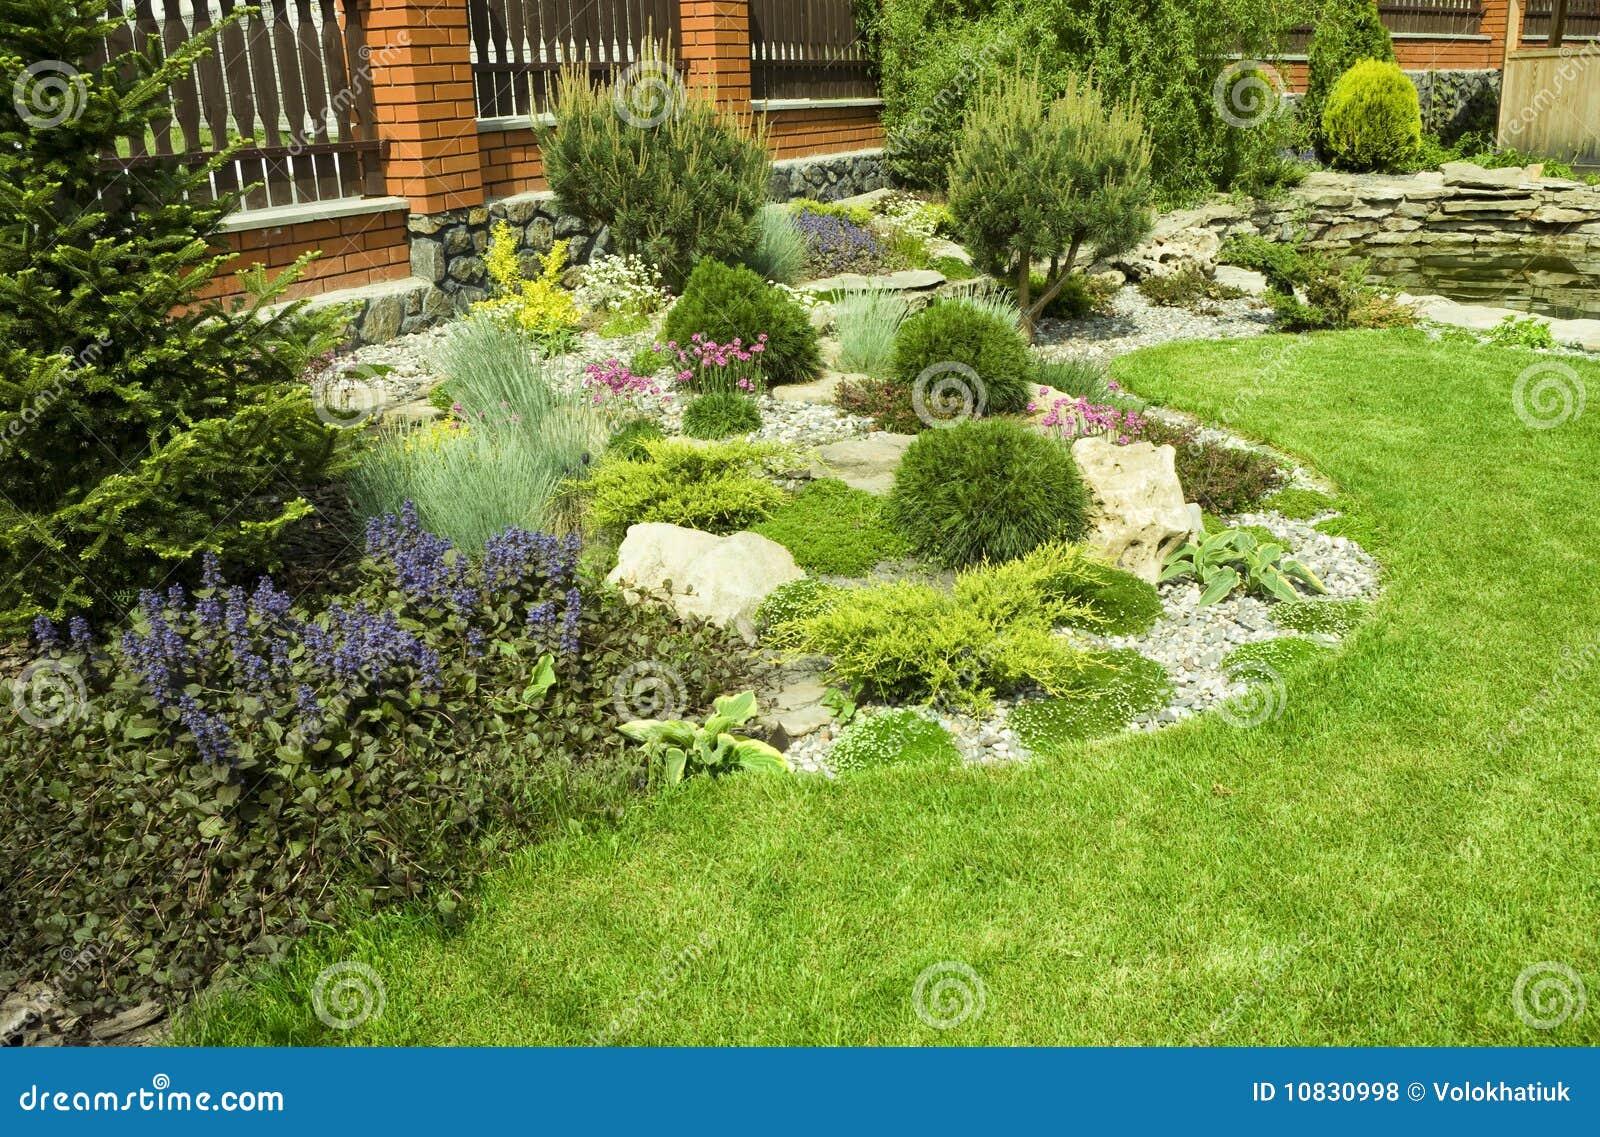 Botanical Garden Royalty Free Stock Photos Image 10830998